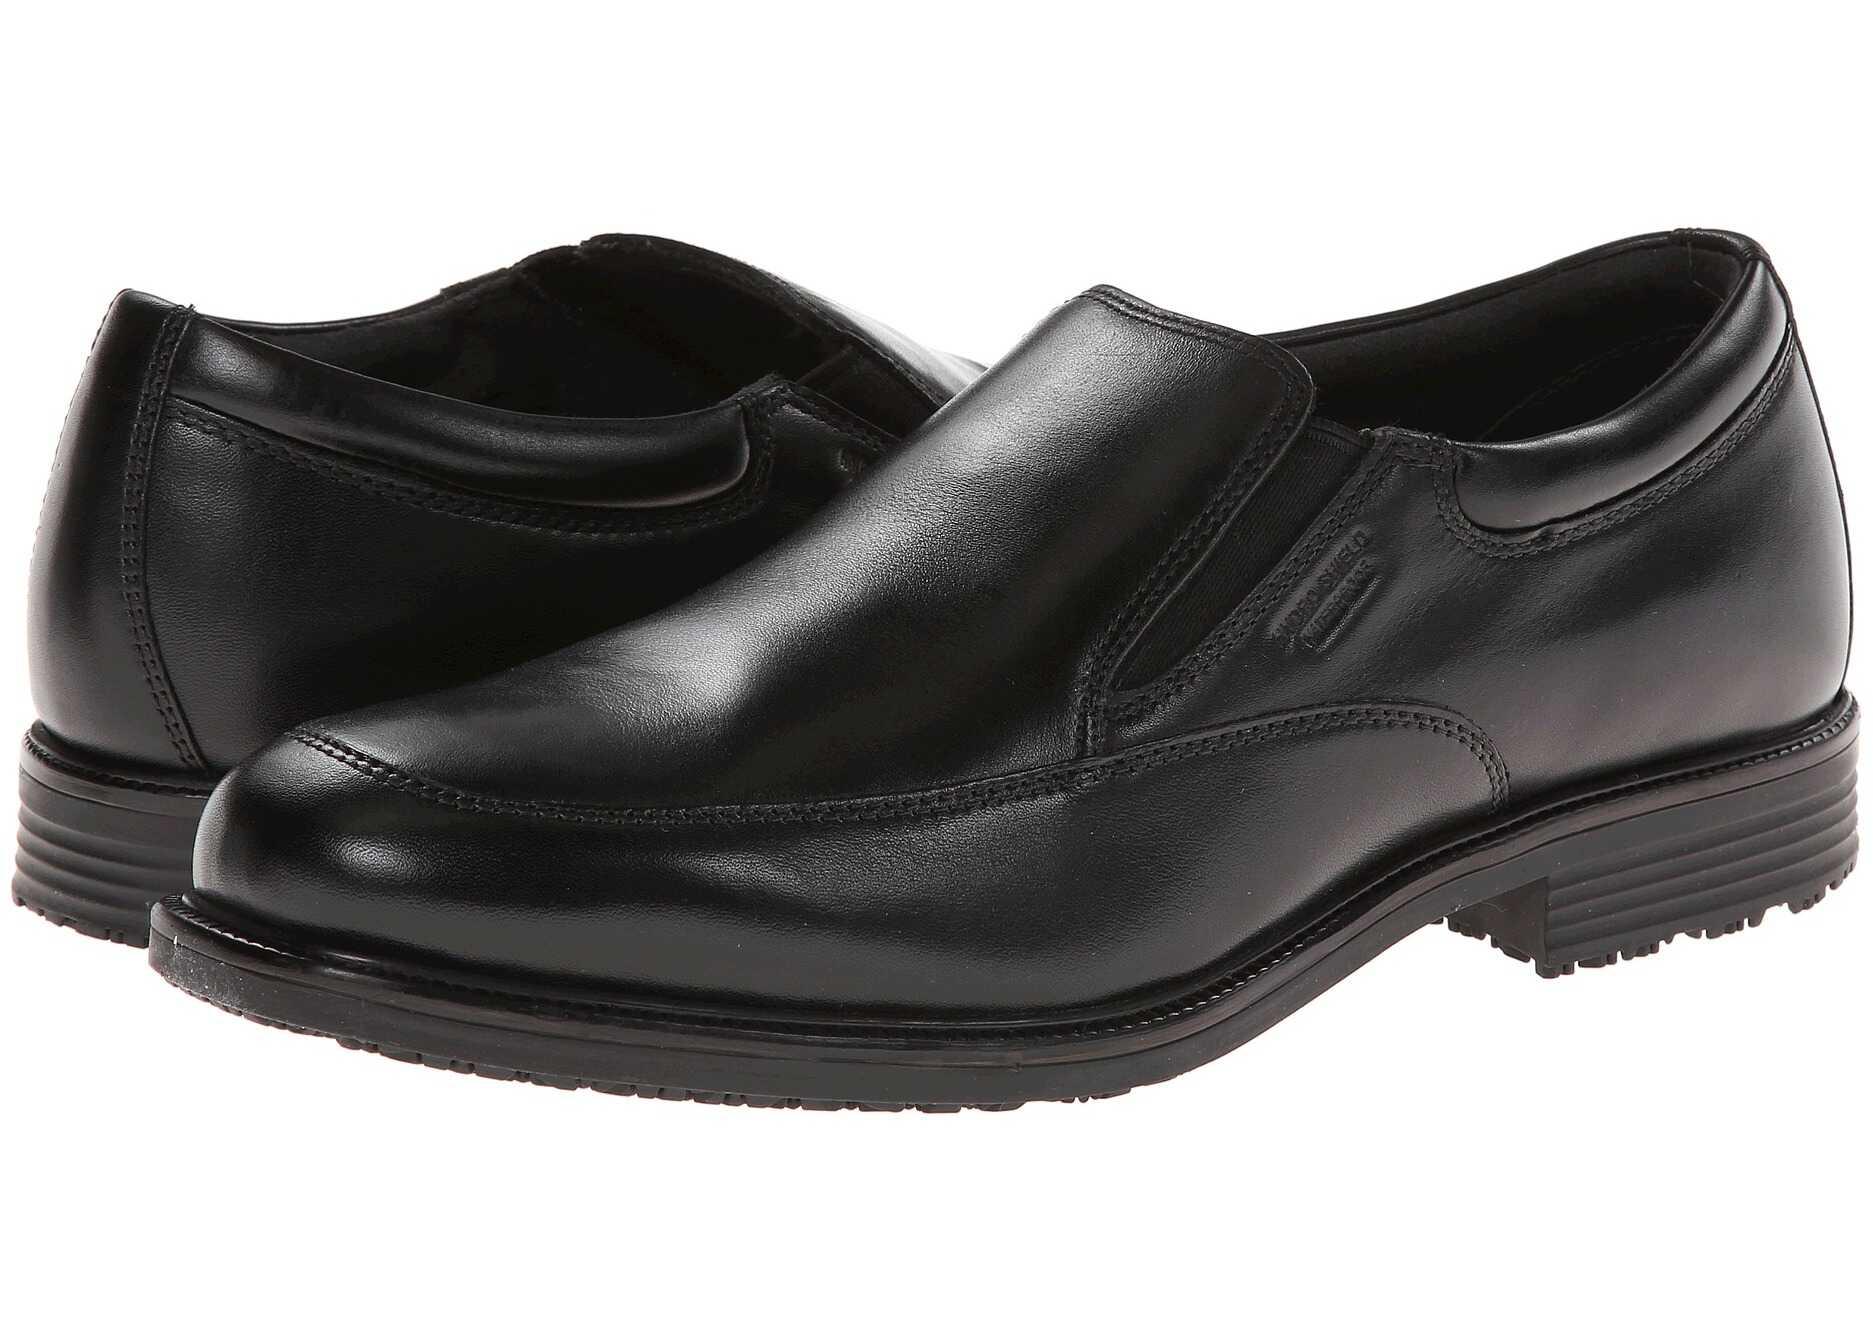 Rockport Lead the Pack Slip-On Black WP Leather